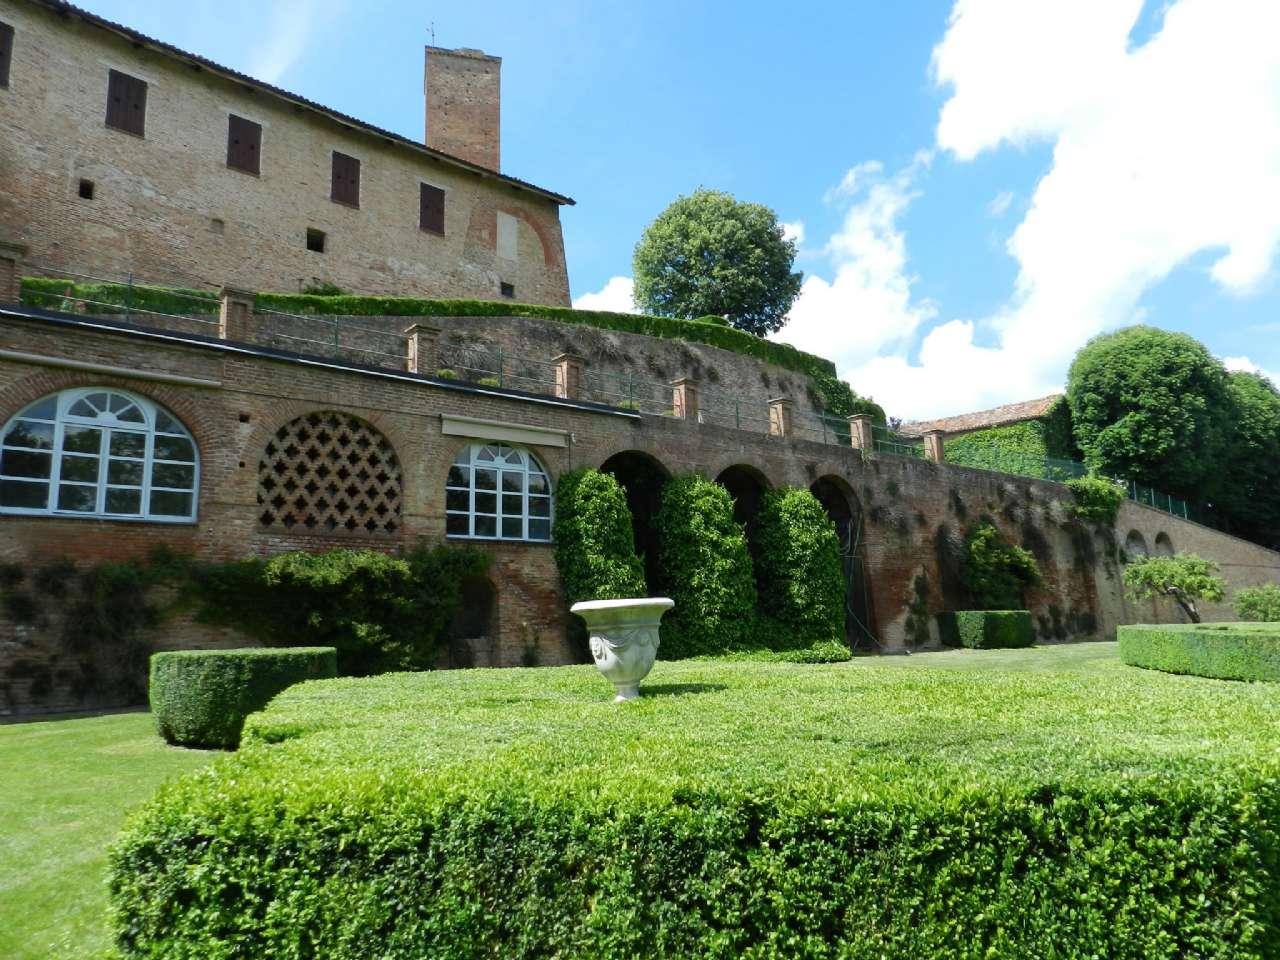 Montiglio Monferrato, Via San Bartolomeo